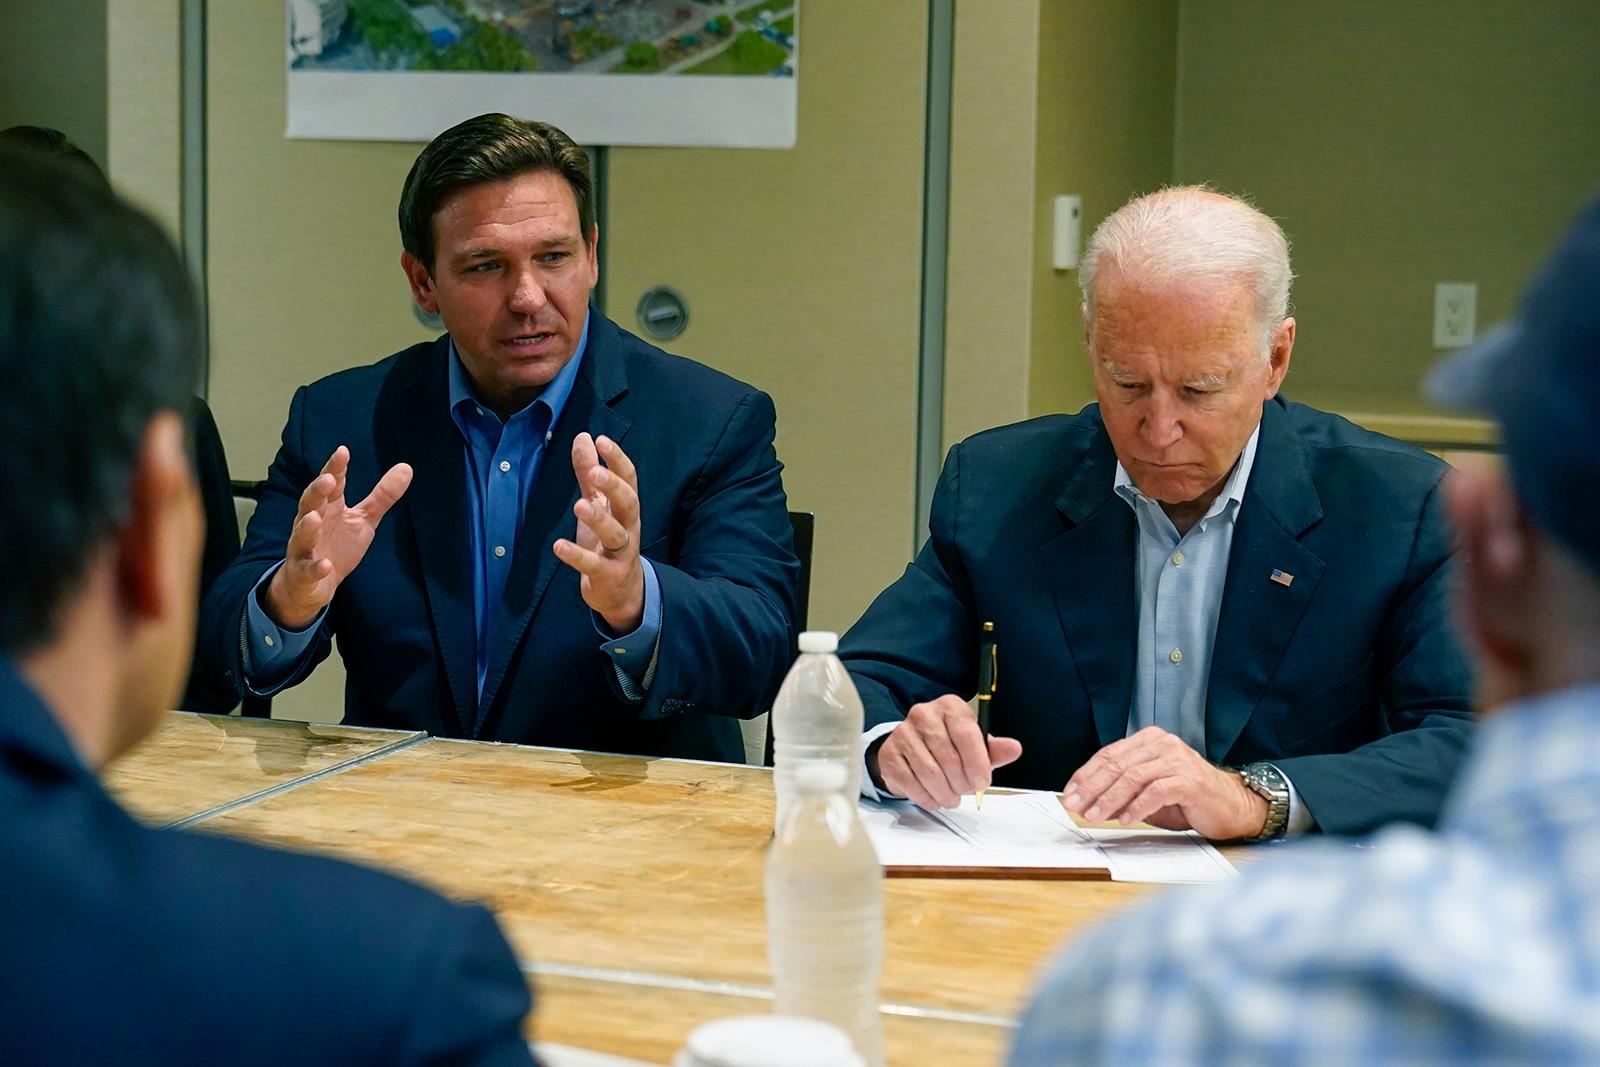 President Joe Biden listens as Florida Gov. Ron DeSantis speaks during a briefing in Miami Beach, Florida, on Thursday, July 1.